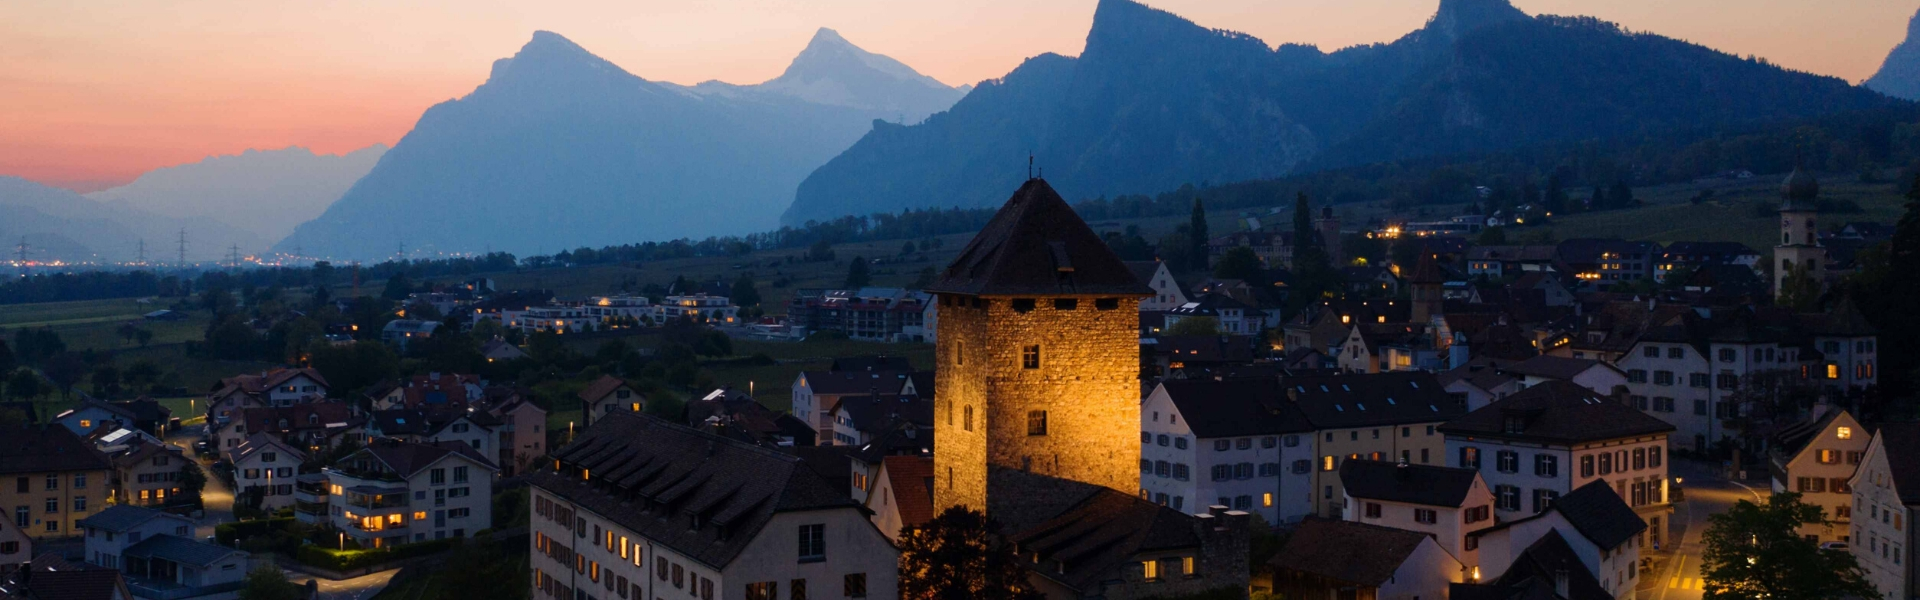 SchlossBrandis